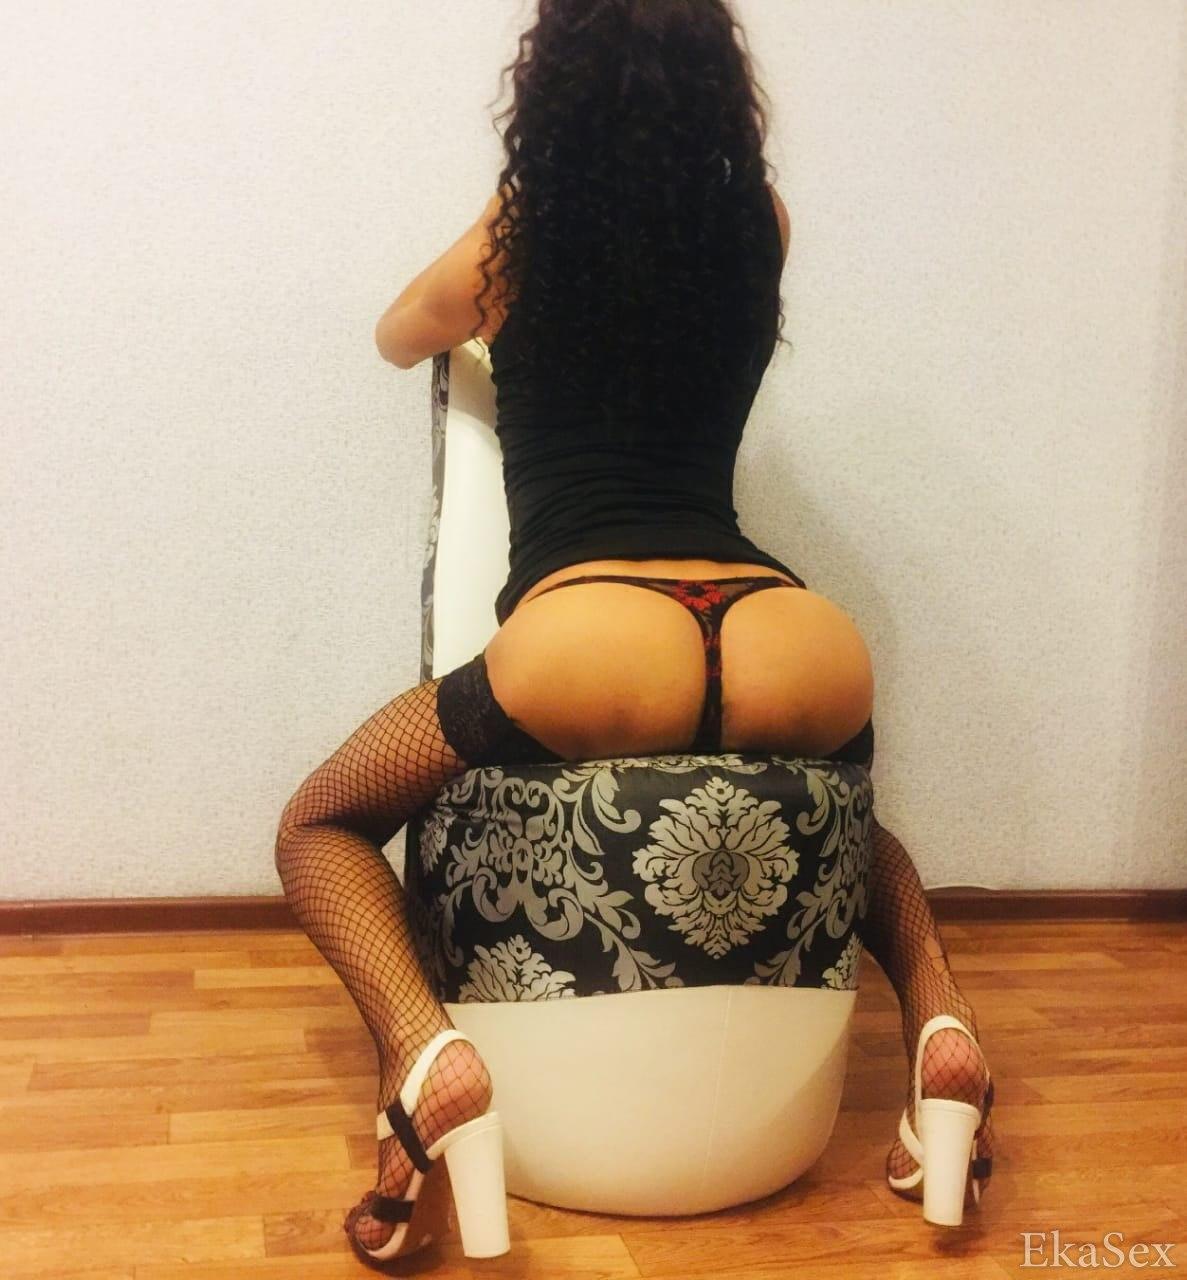 фото проститутки Варвара из города Екатеринбург